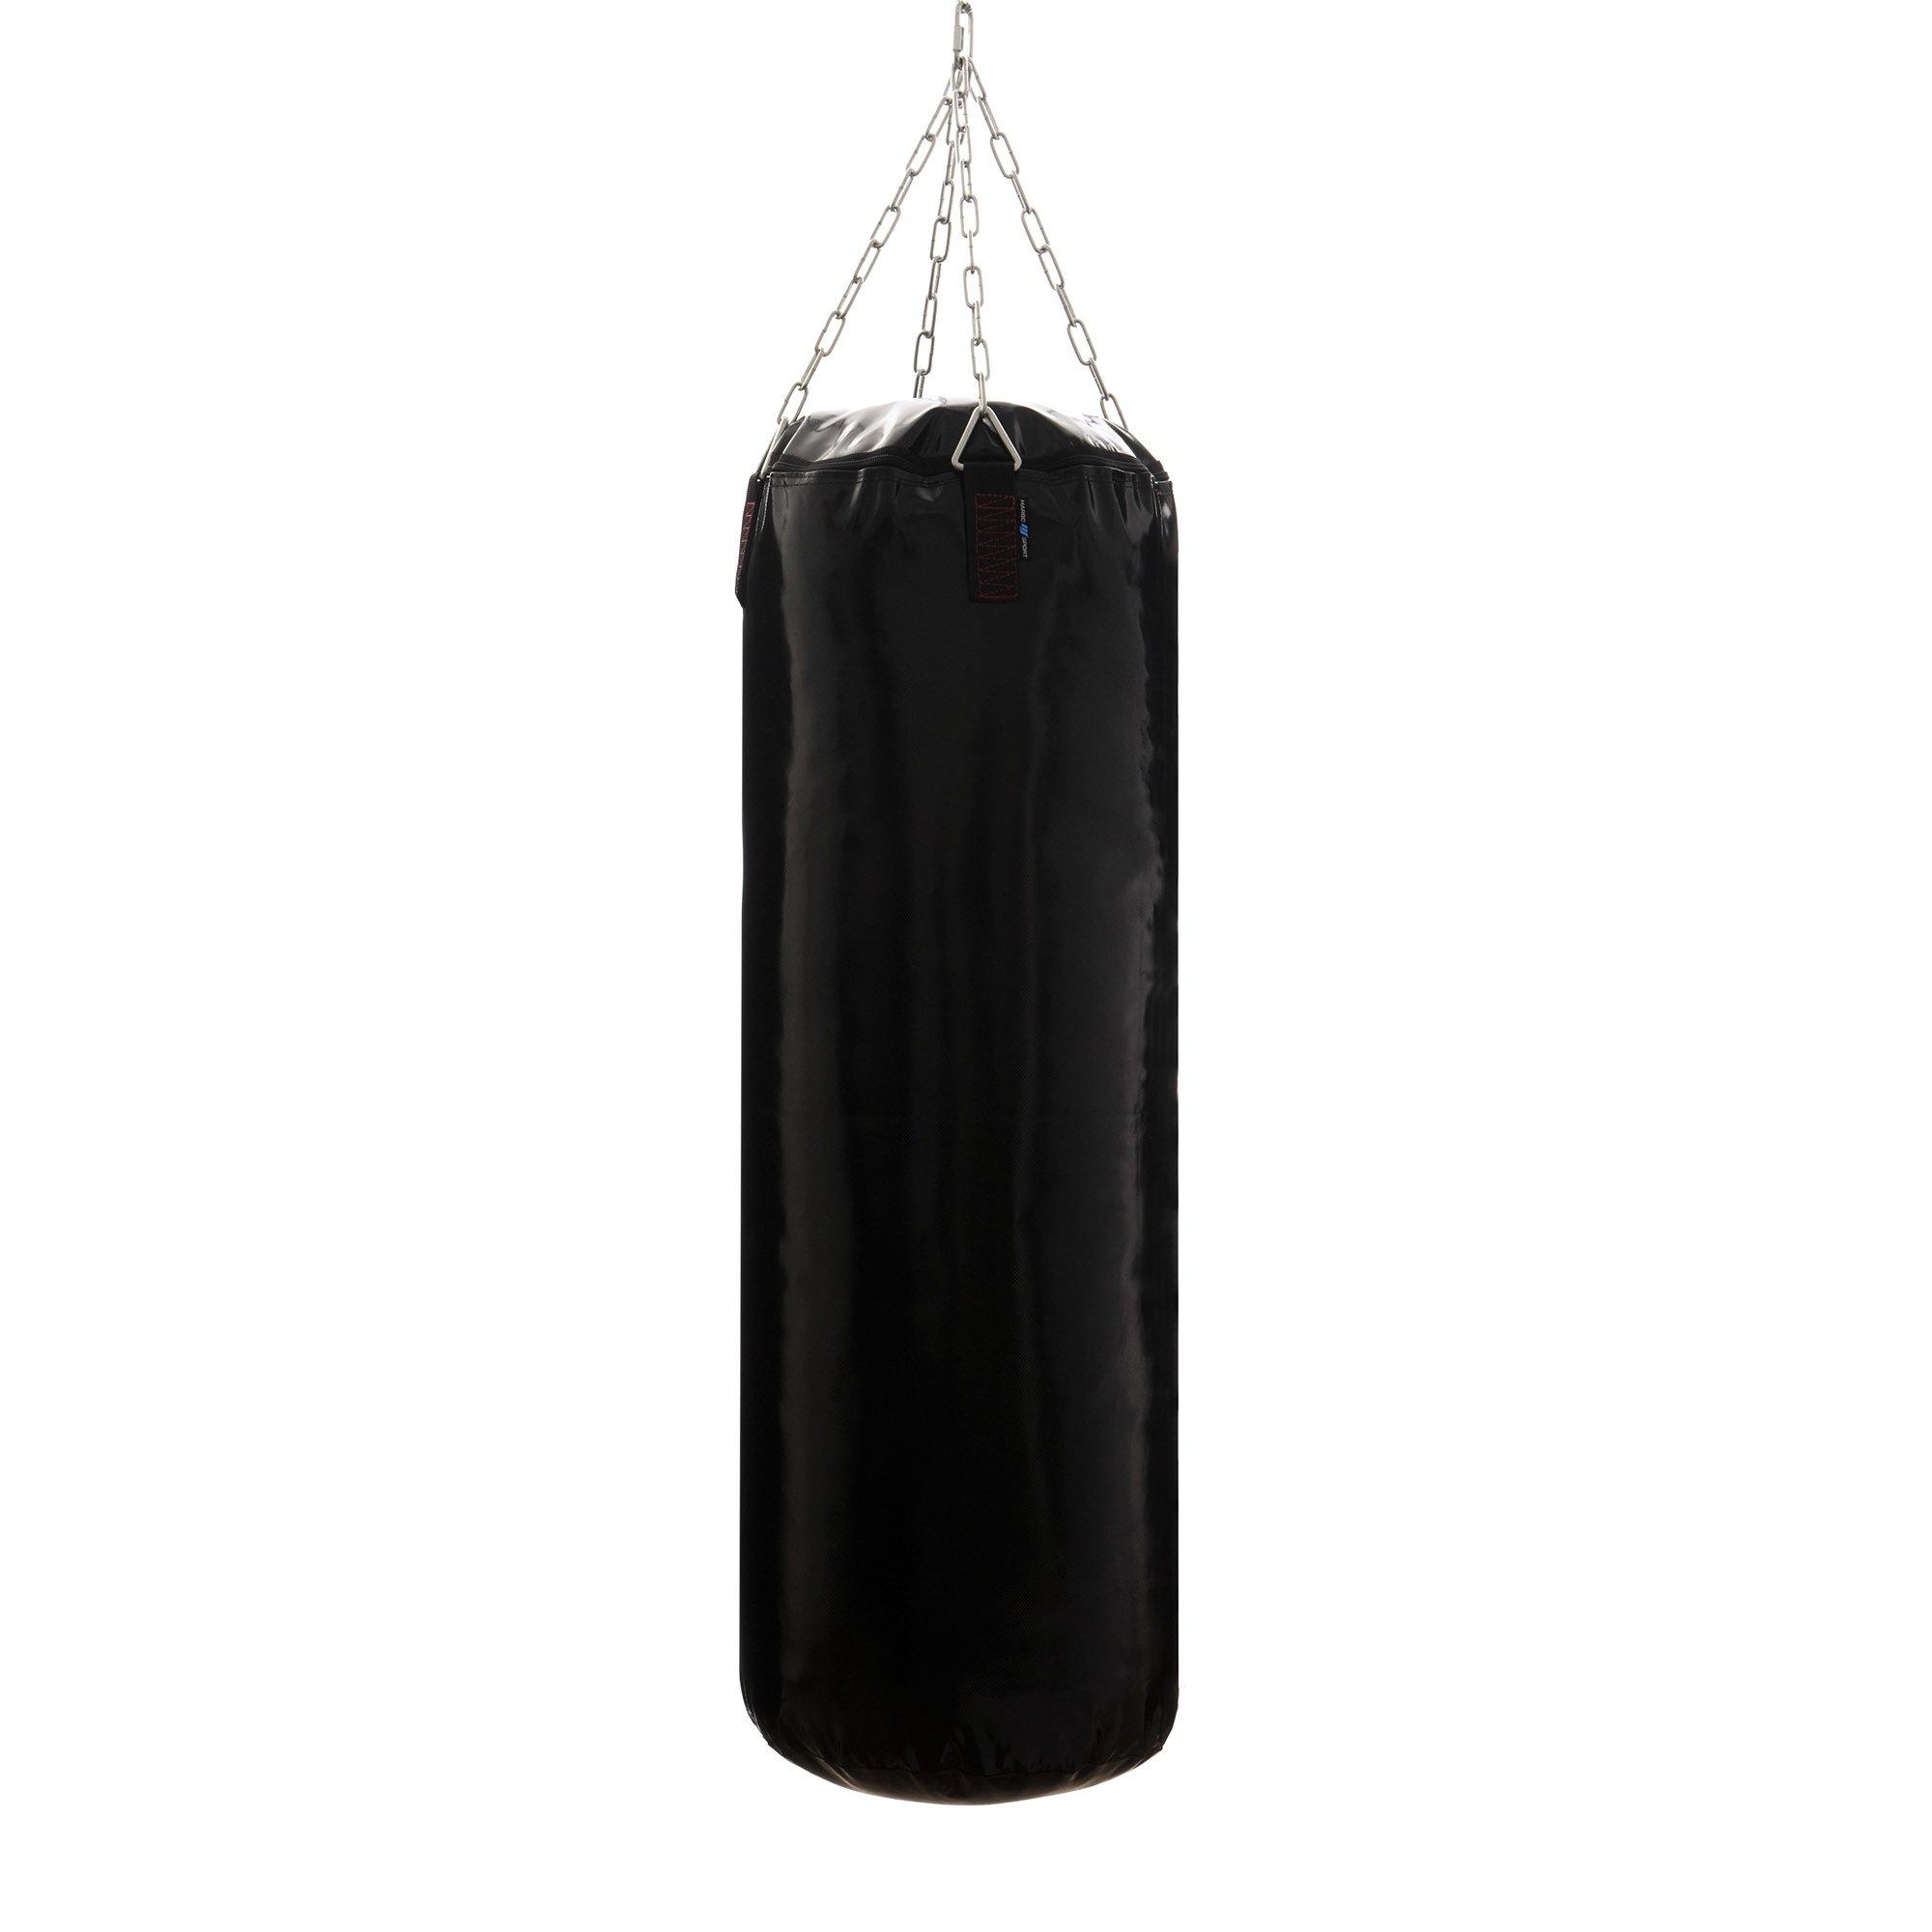 Image of Worek bokserski 180 cm fi35 cm + torpeda mc-w180|35 - marbo sport